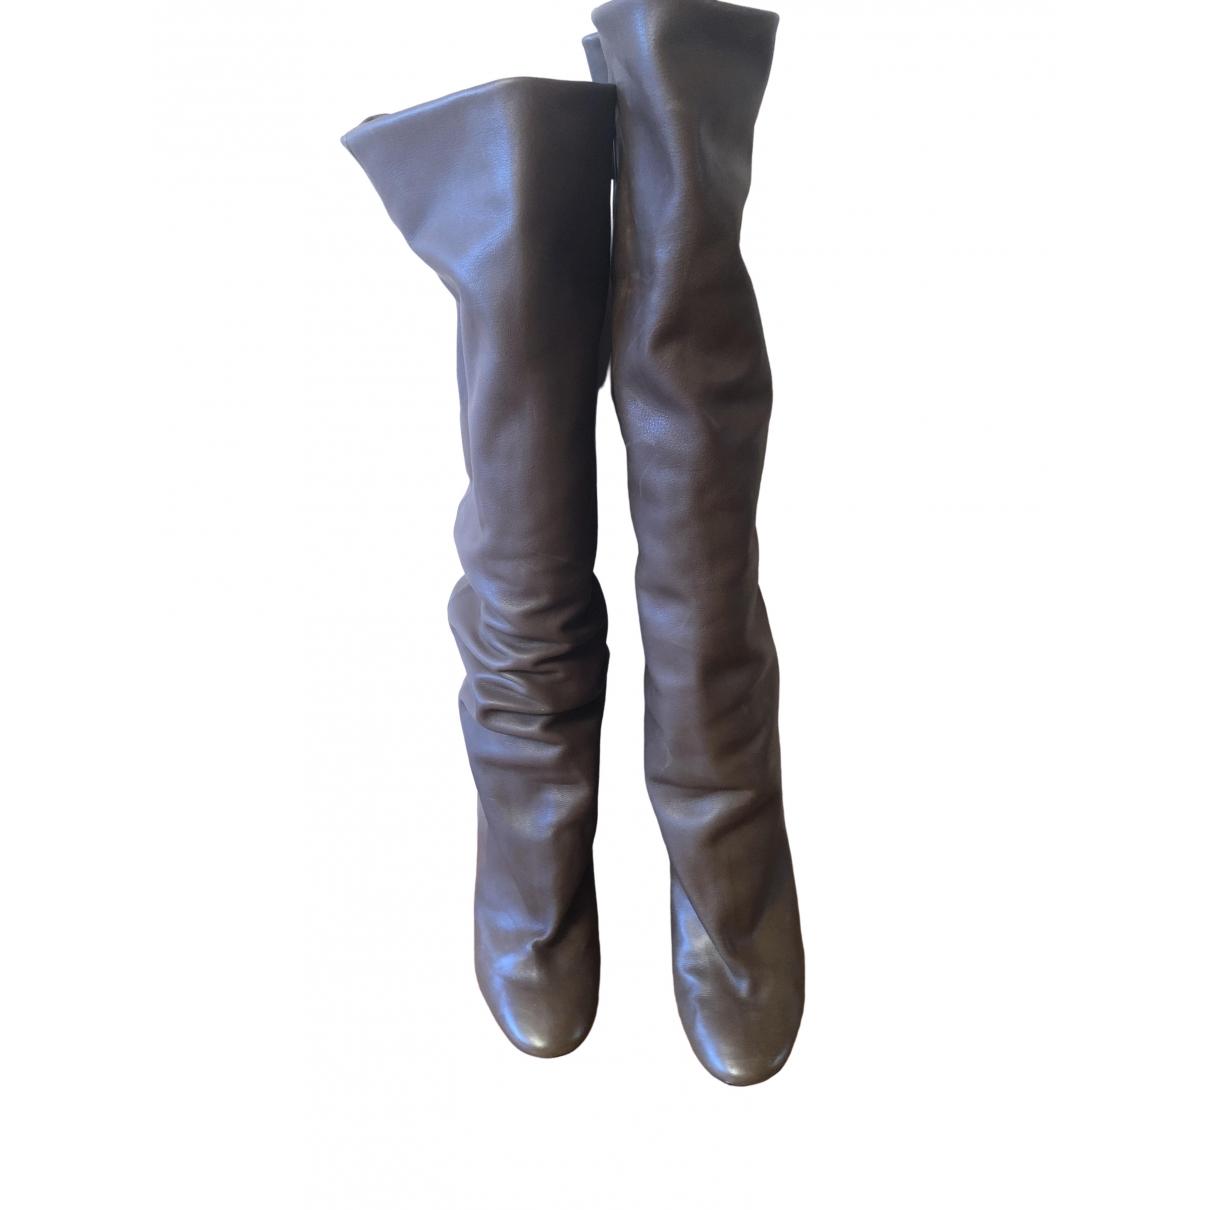 Isabel Marant Lakfee Stiefel in  Khaki Leder